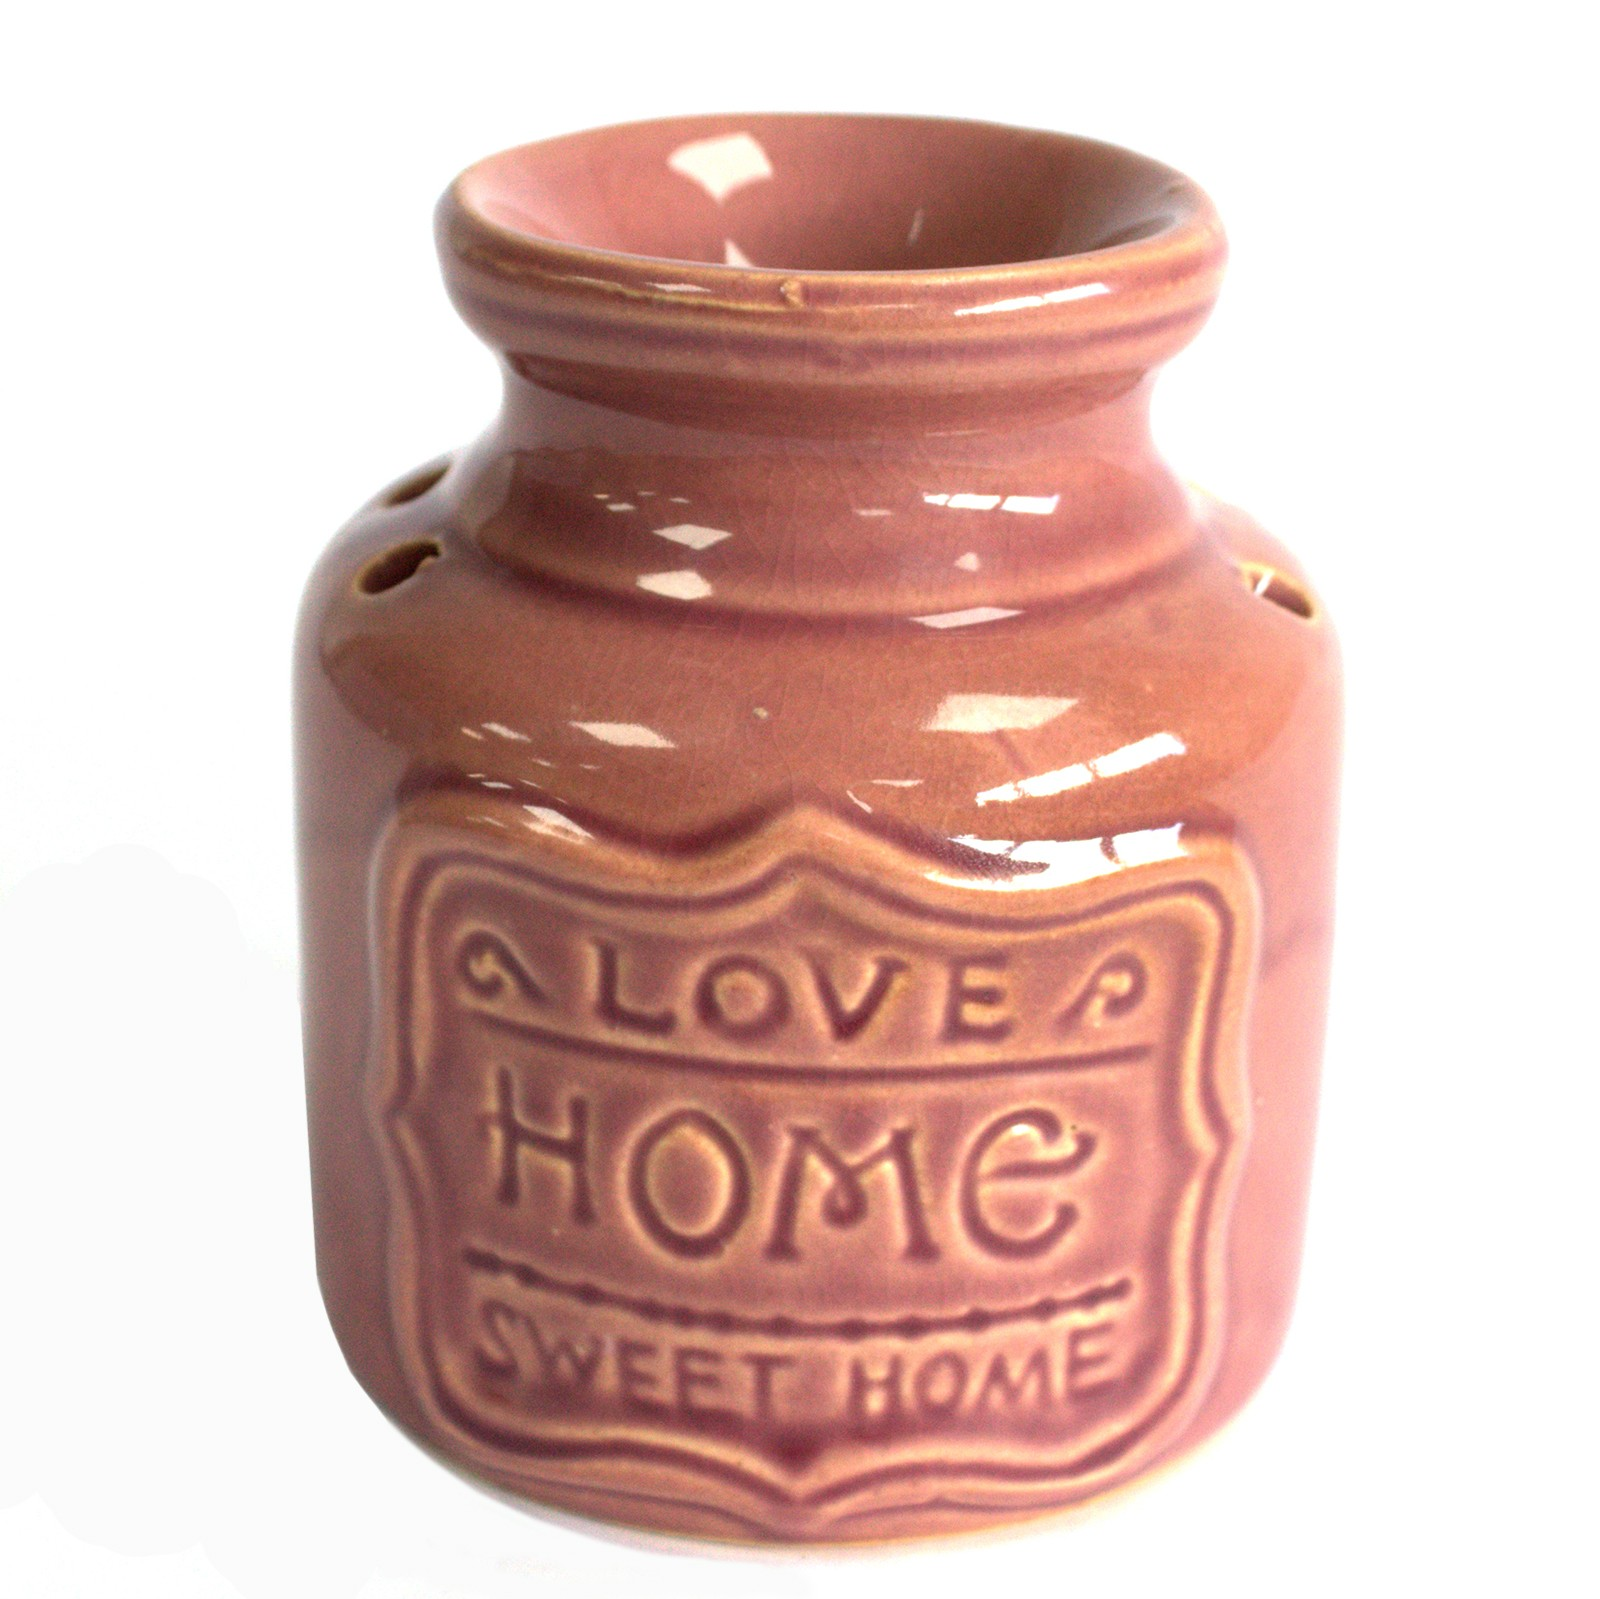 Lrg Home Oil Burner Lavender Love Home Sweet Home